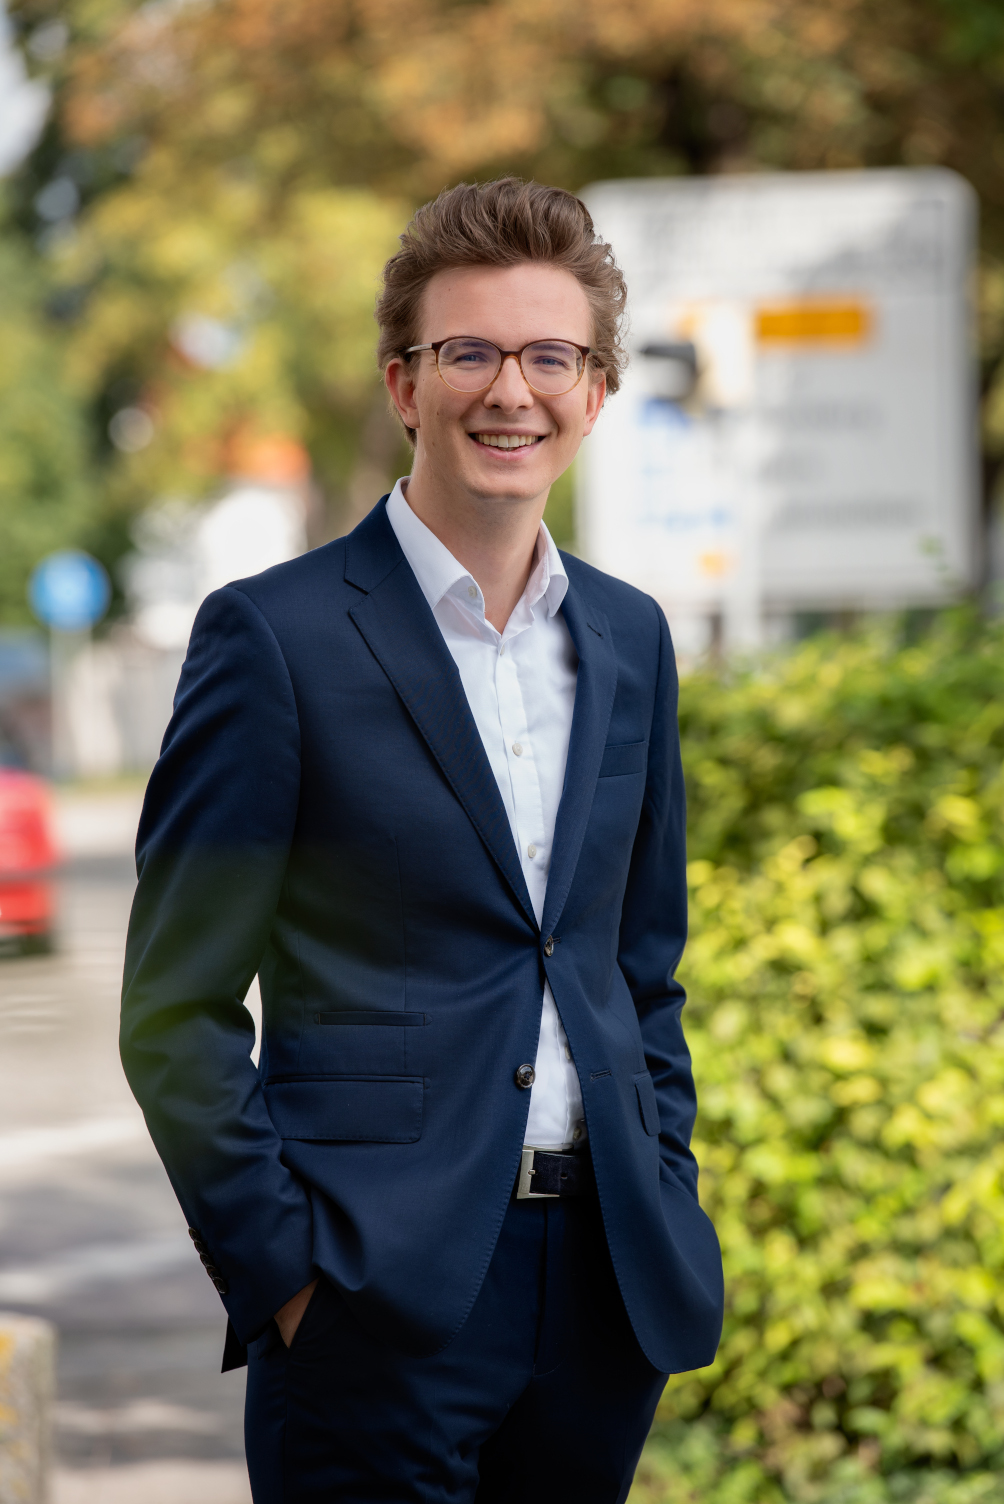 3 Fragen an unseren Kandidaten Leon Eckert